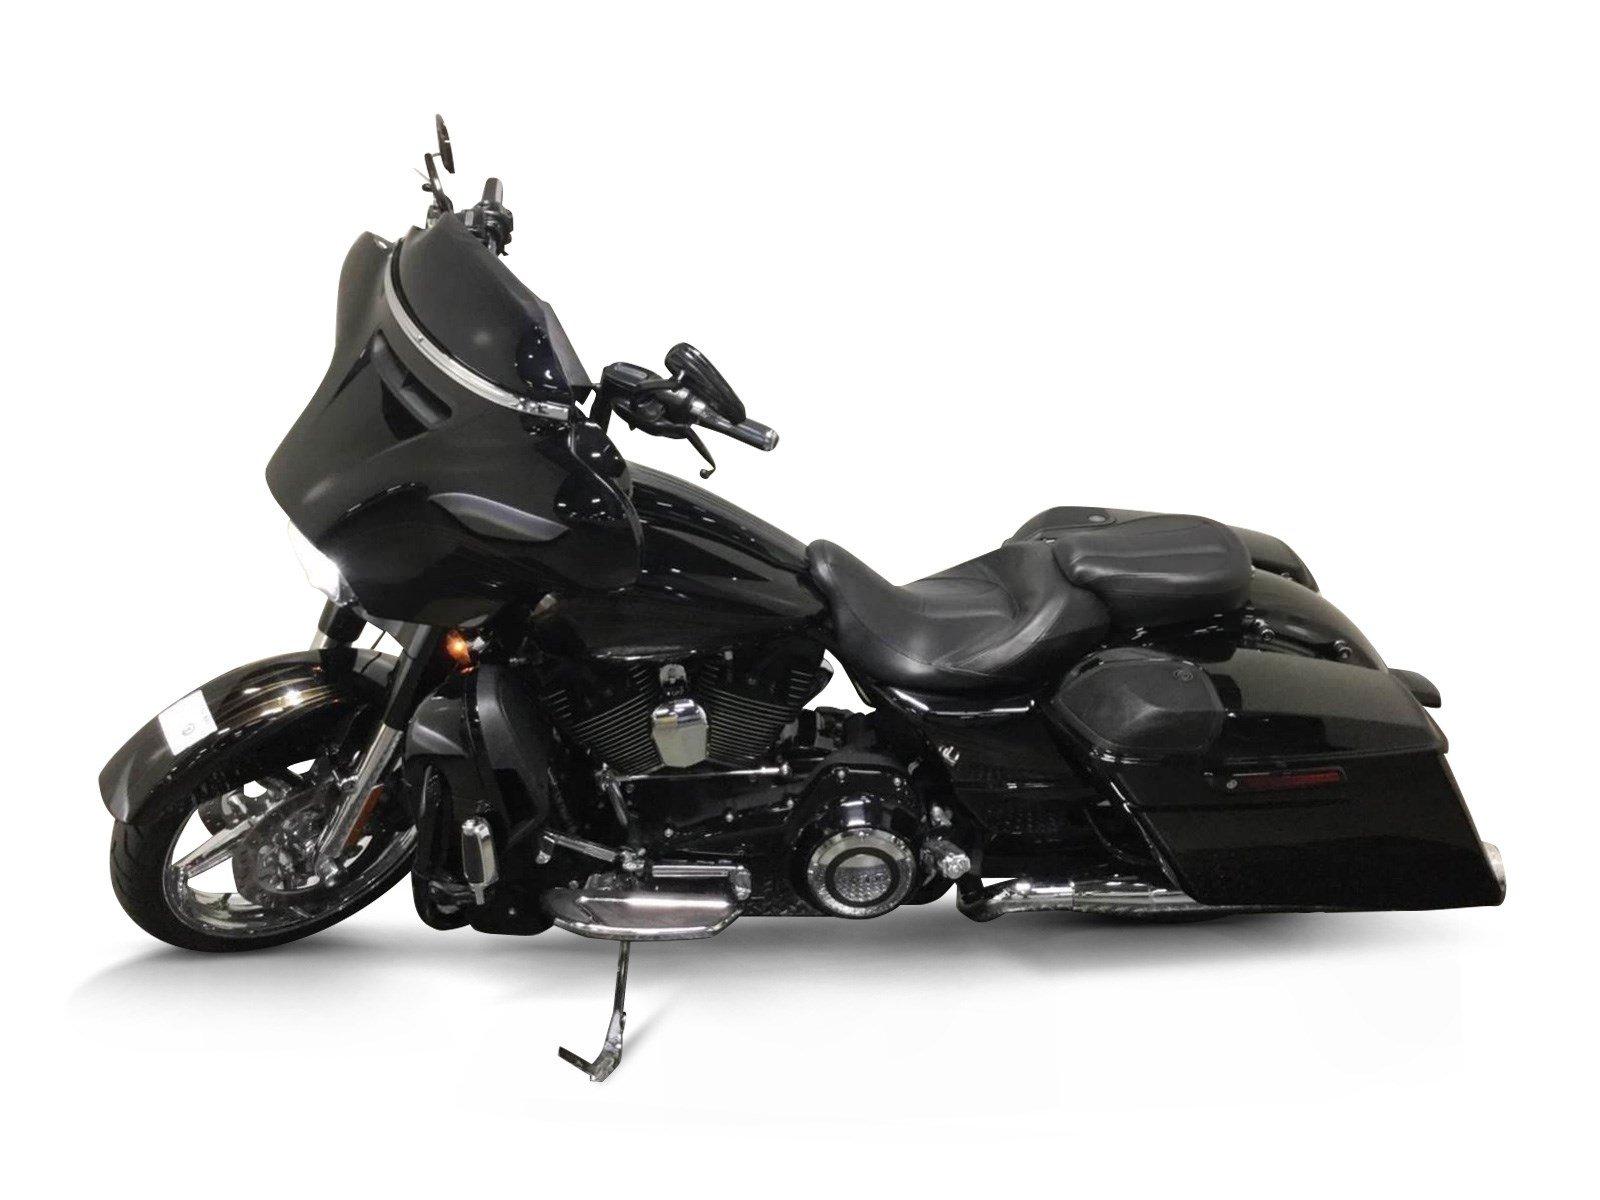 Harley Street Glide For Sale >> 2015 Harley Davidson Flhxse Cvo Street Glide Special